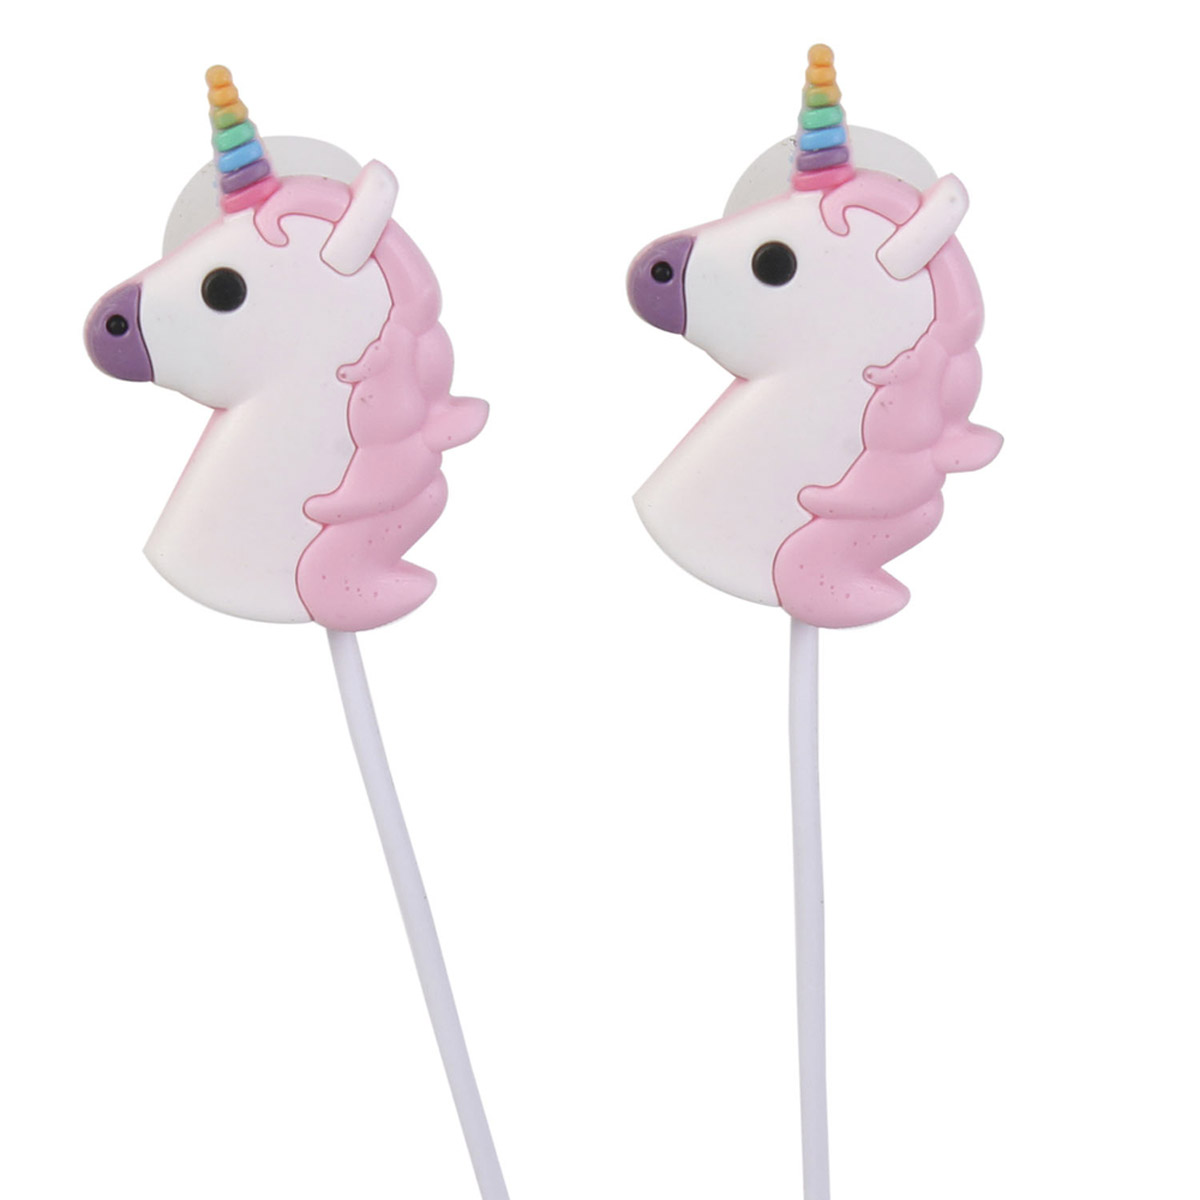 Ecouteurs \'Licorne My Unicorn\' blanc rose - 25x15 mm - [R2419]